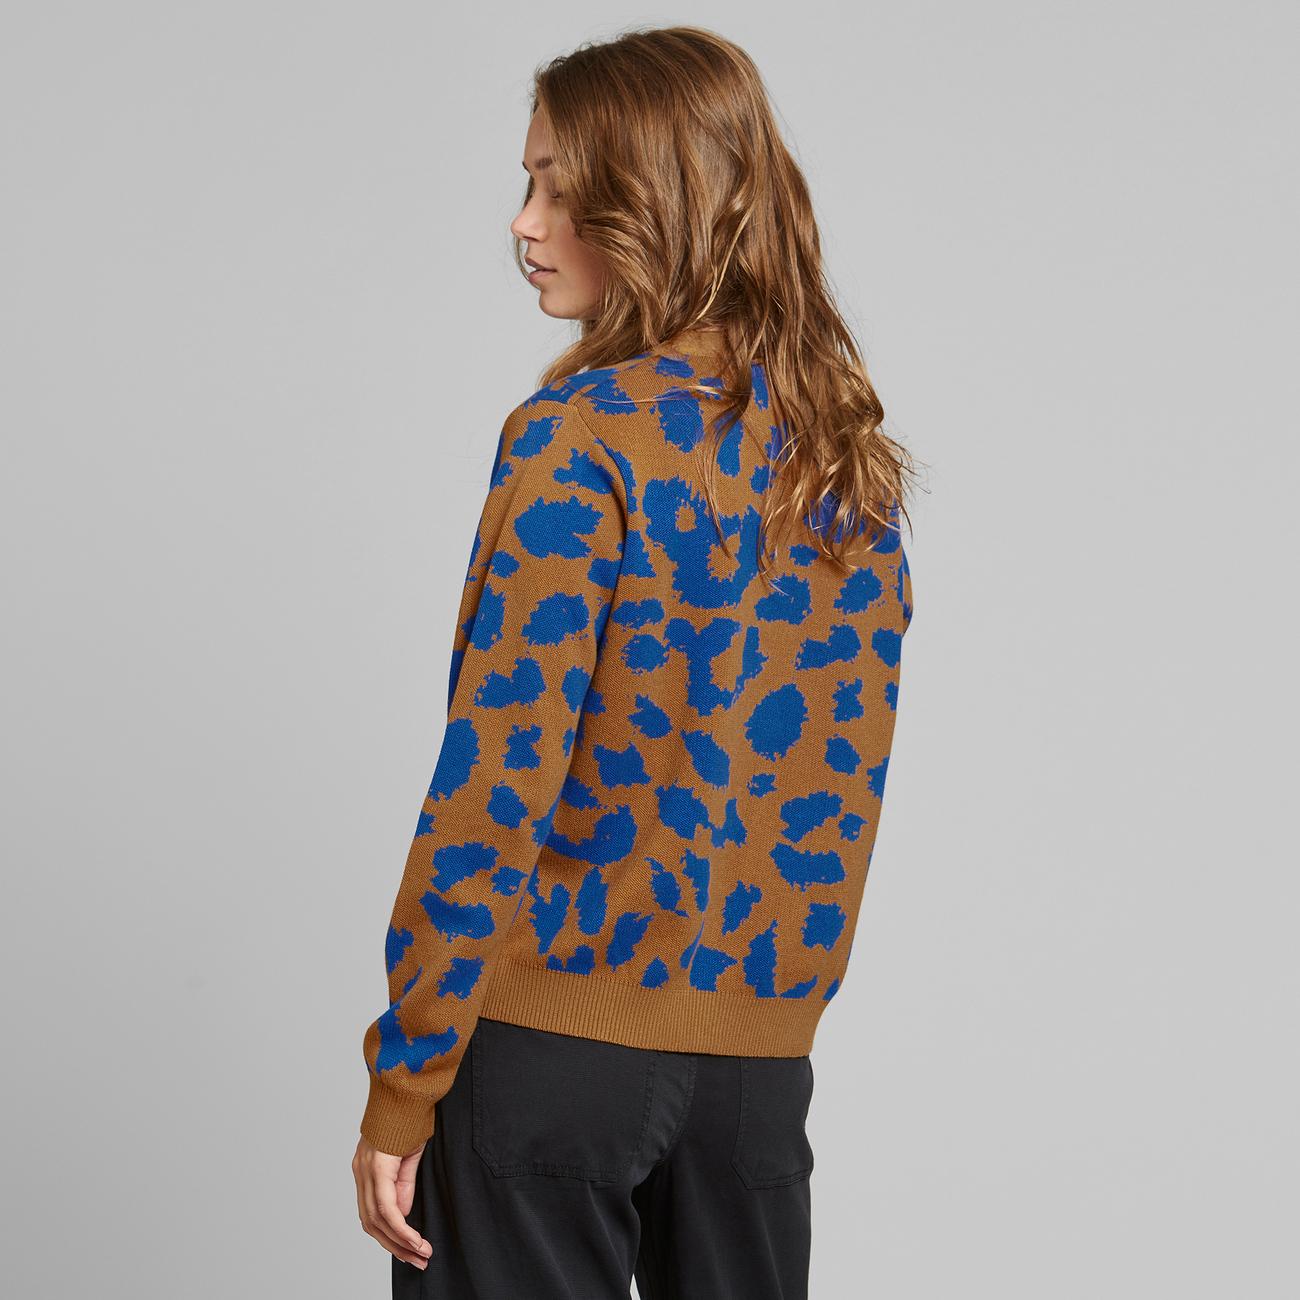 Cardigan Iggesund Leopard Light Brown